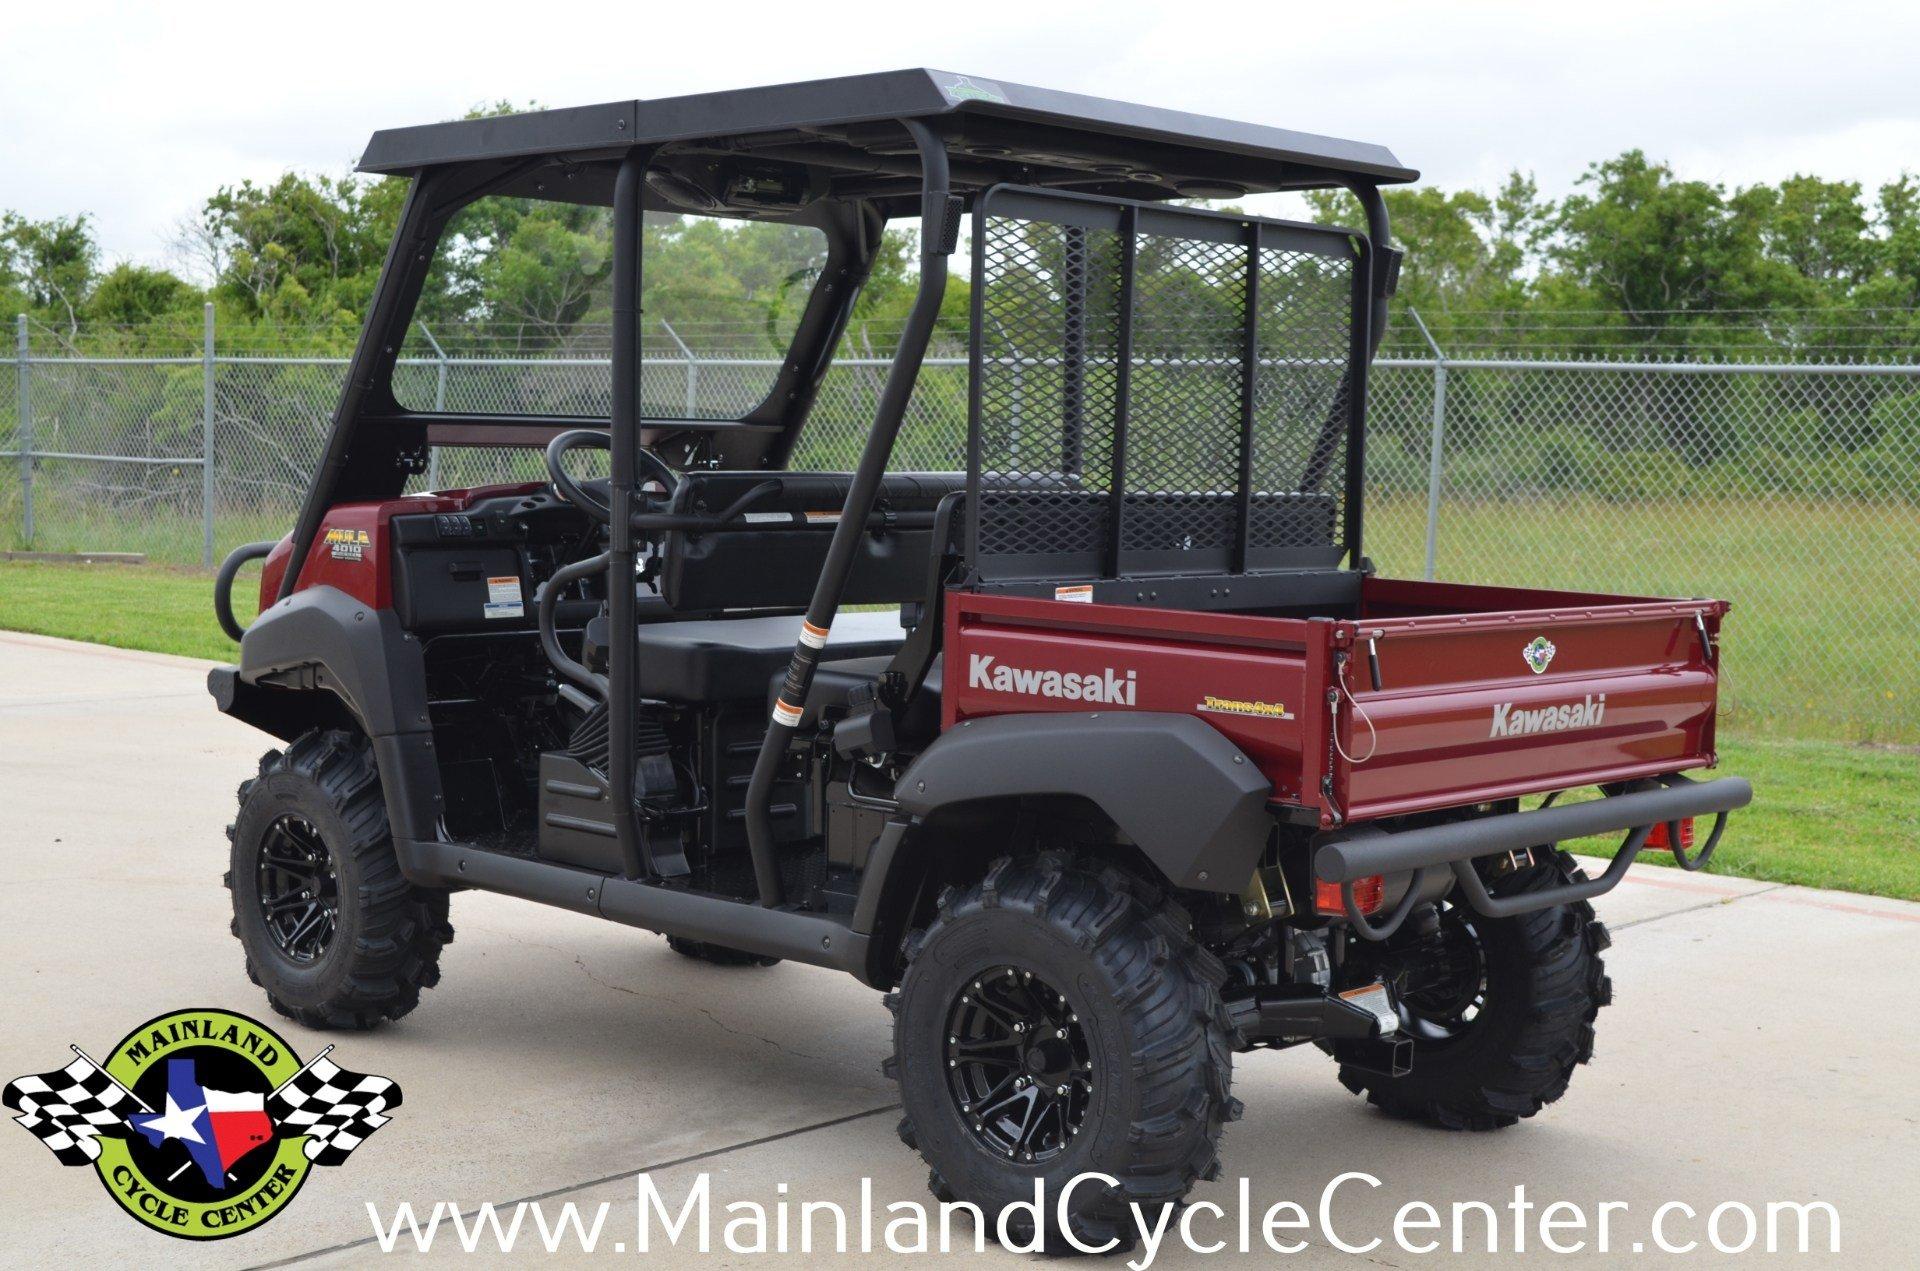 New 2013 Kawasaki Mule 4010 Trans4x4 Diesel Dark Royal Red Fuel Filter In La Marque Texas